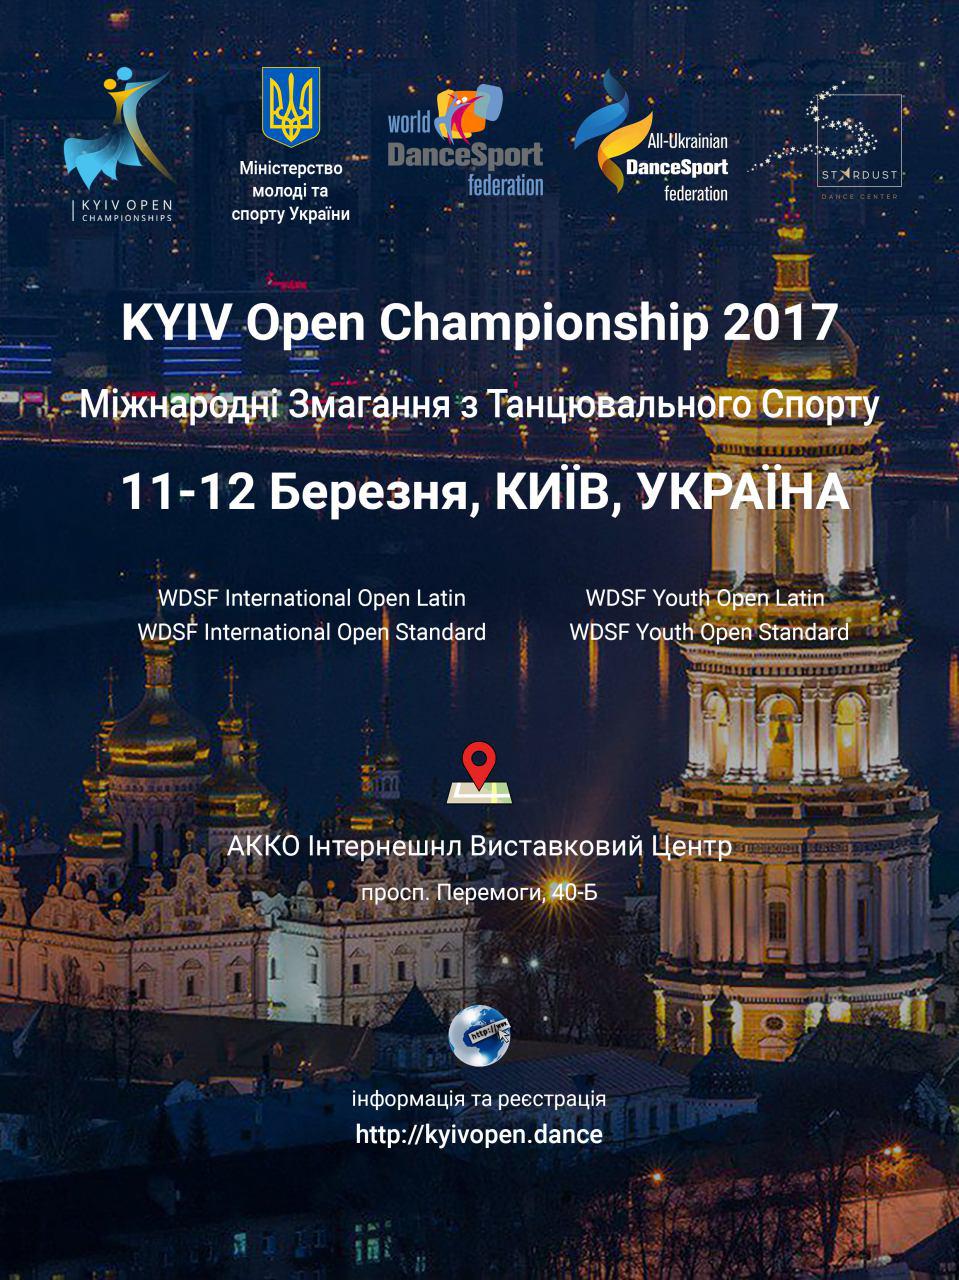 KYIV Open Championship 2017